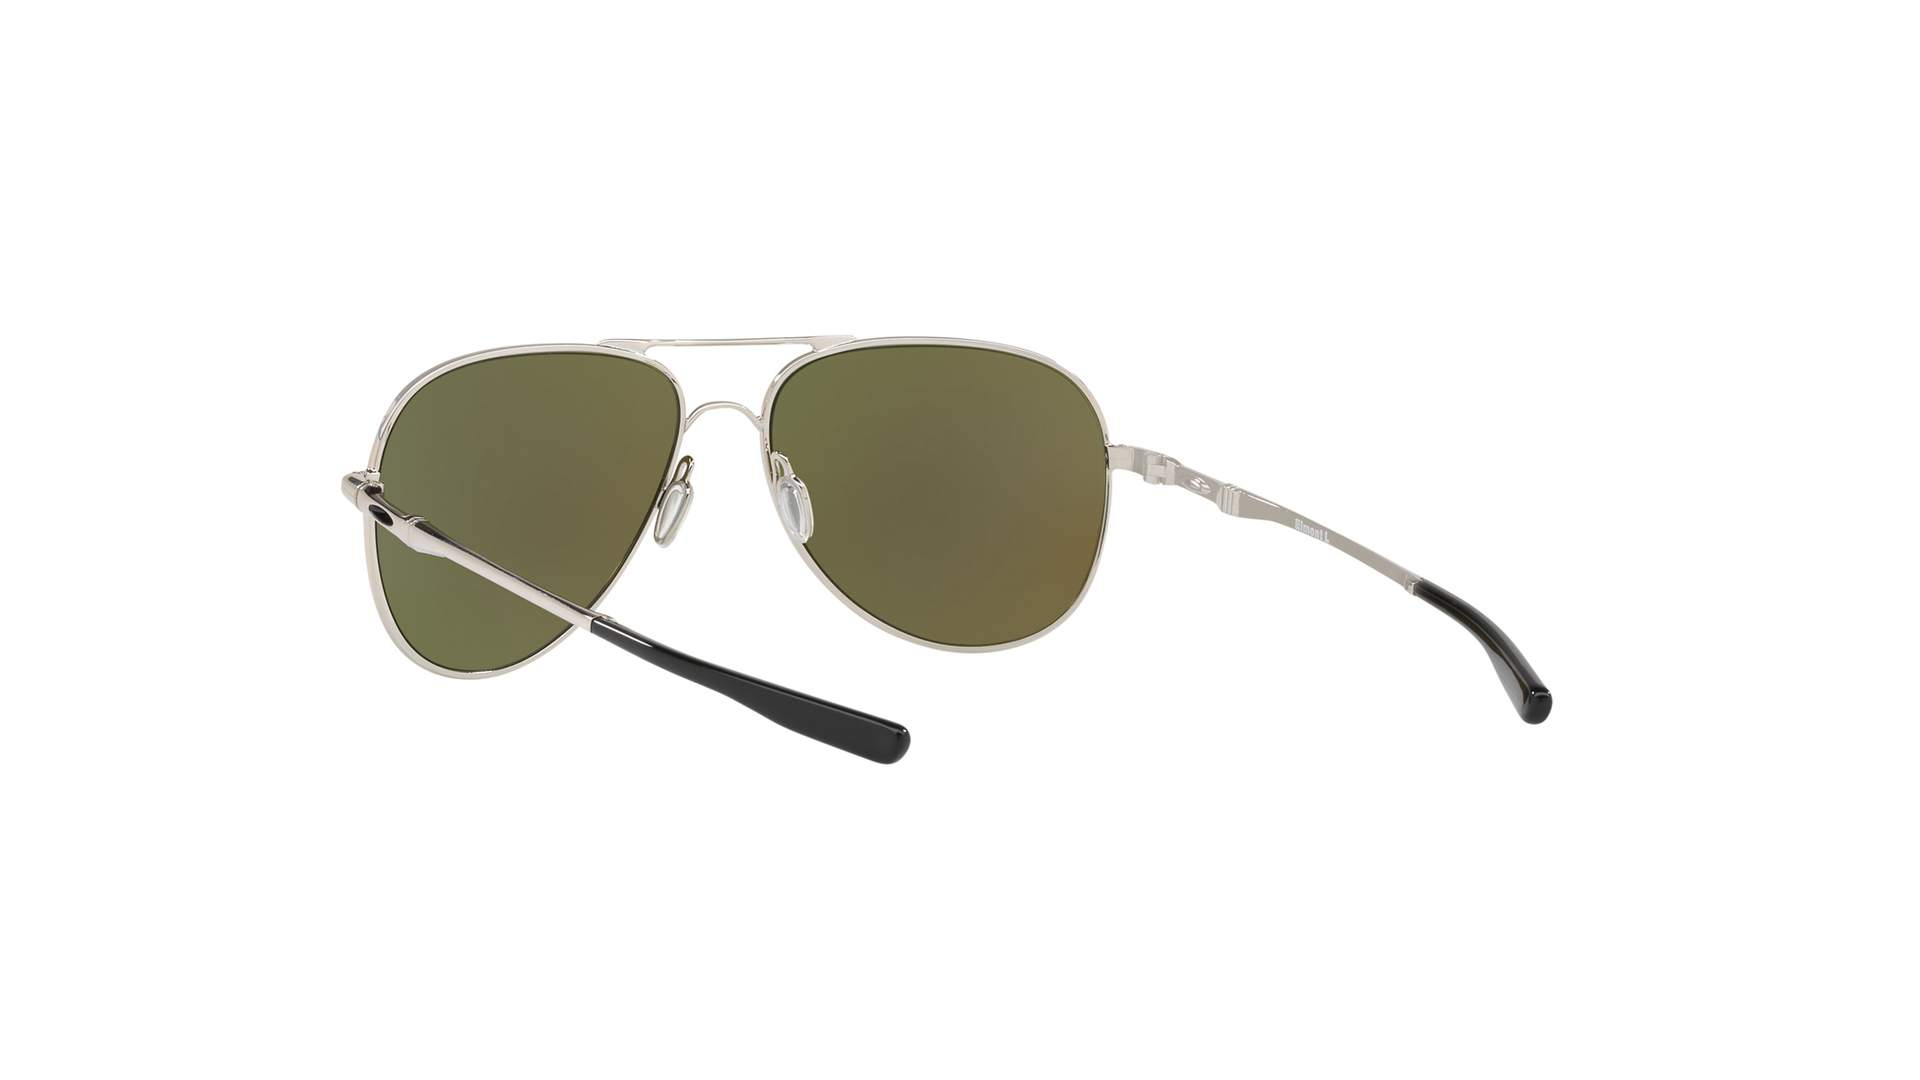 dc4a9ca6098 Sunglasses Oakley Elmont m Silver Prizm OO4119 10 58-15 Medium Mirror